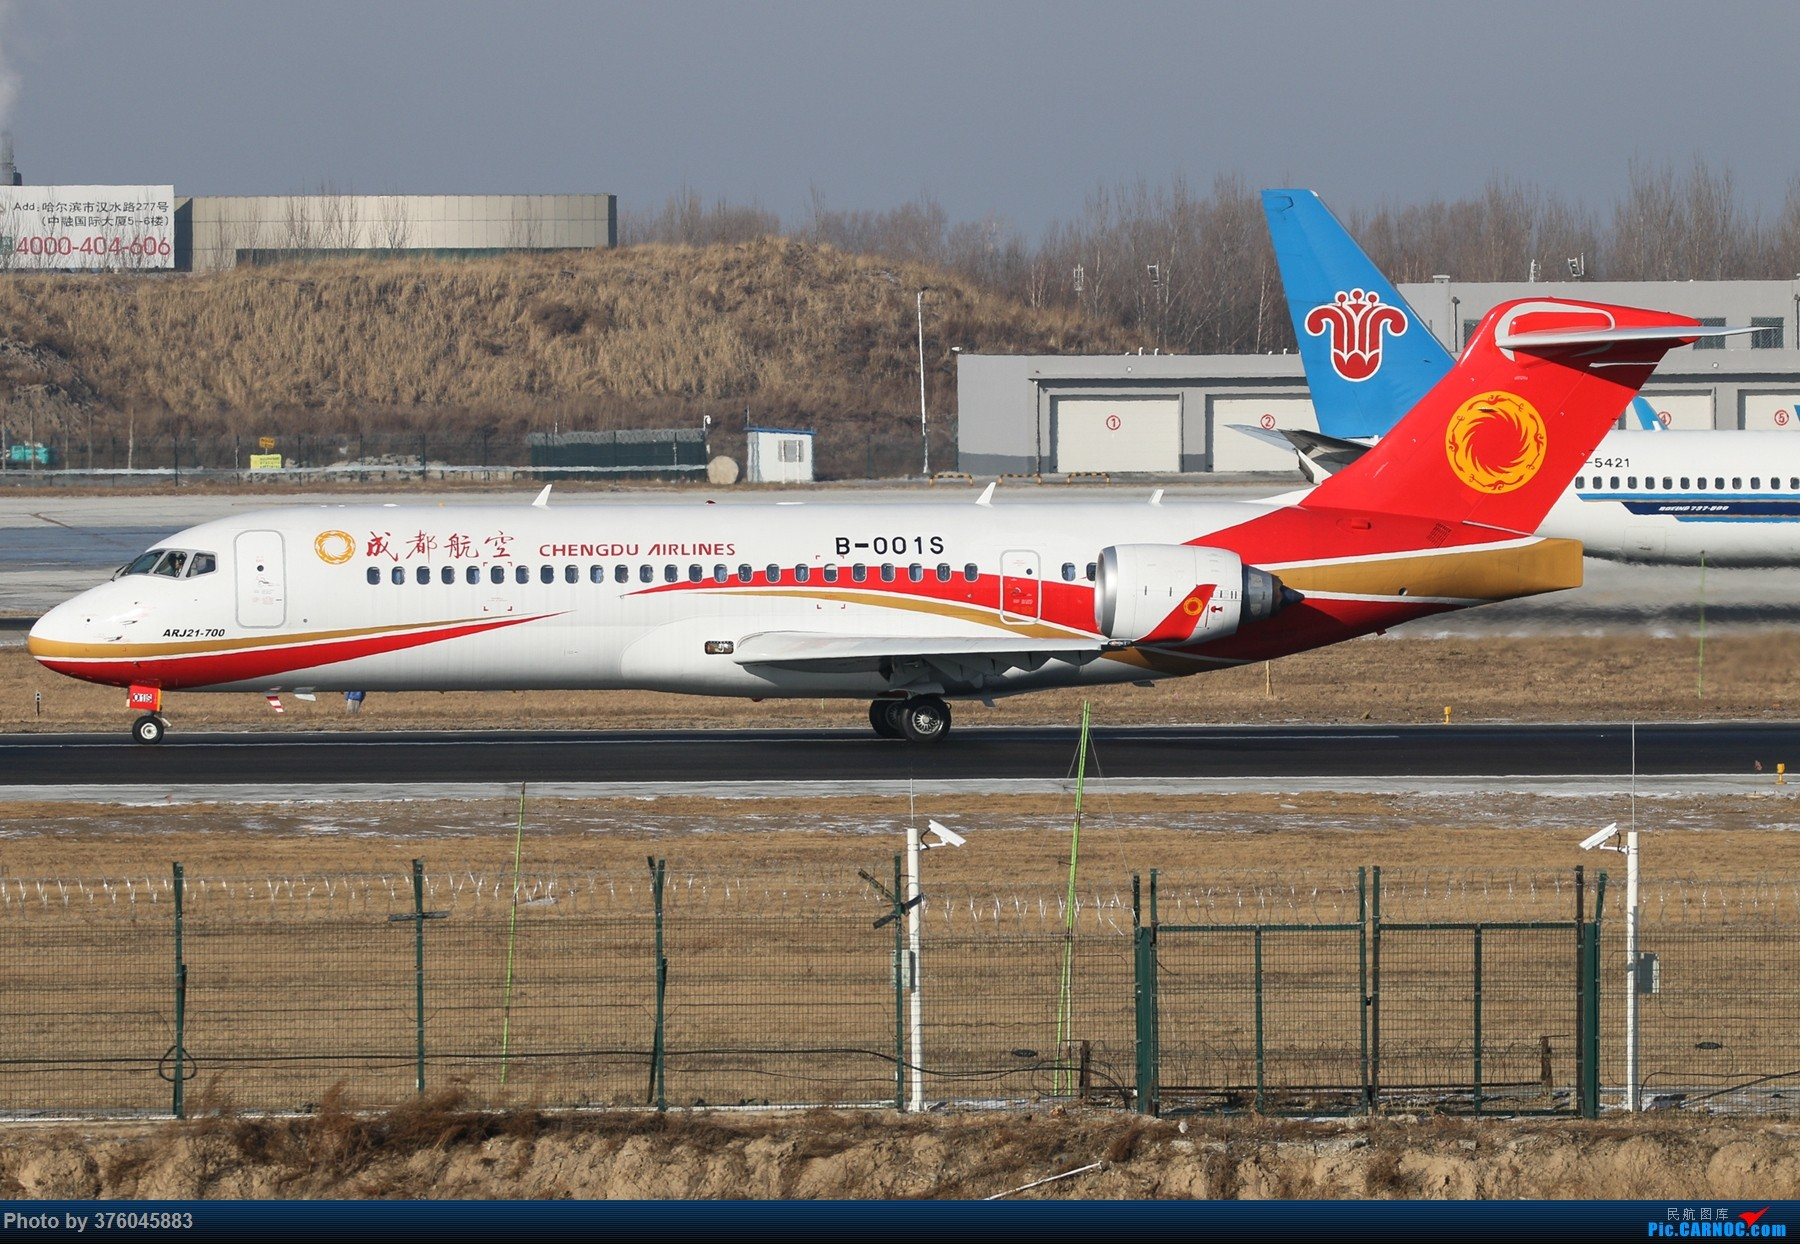 【HRB】莫名感觉时间变快了? COMAC ARJ21-700 B-001S 中国哈尔滨太平国际机场